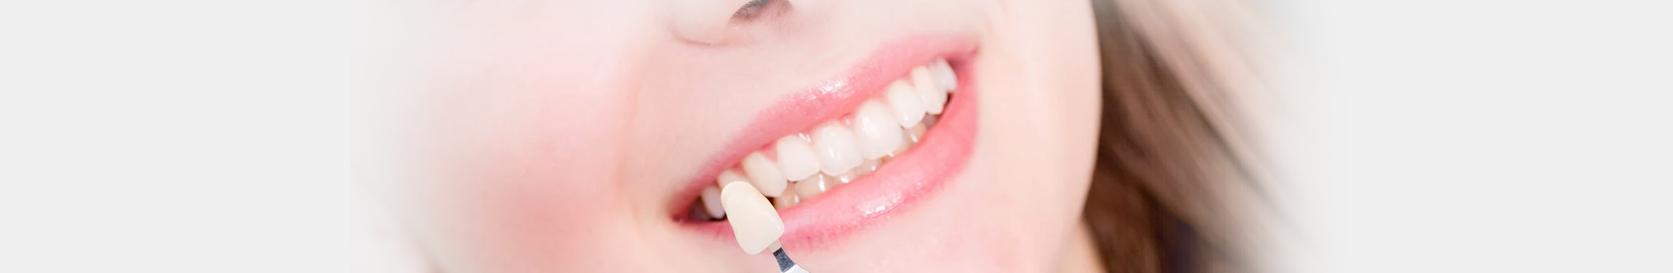 Dental color matching